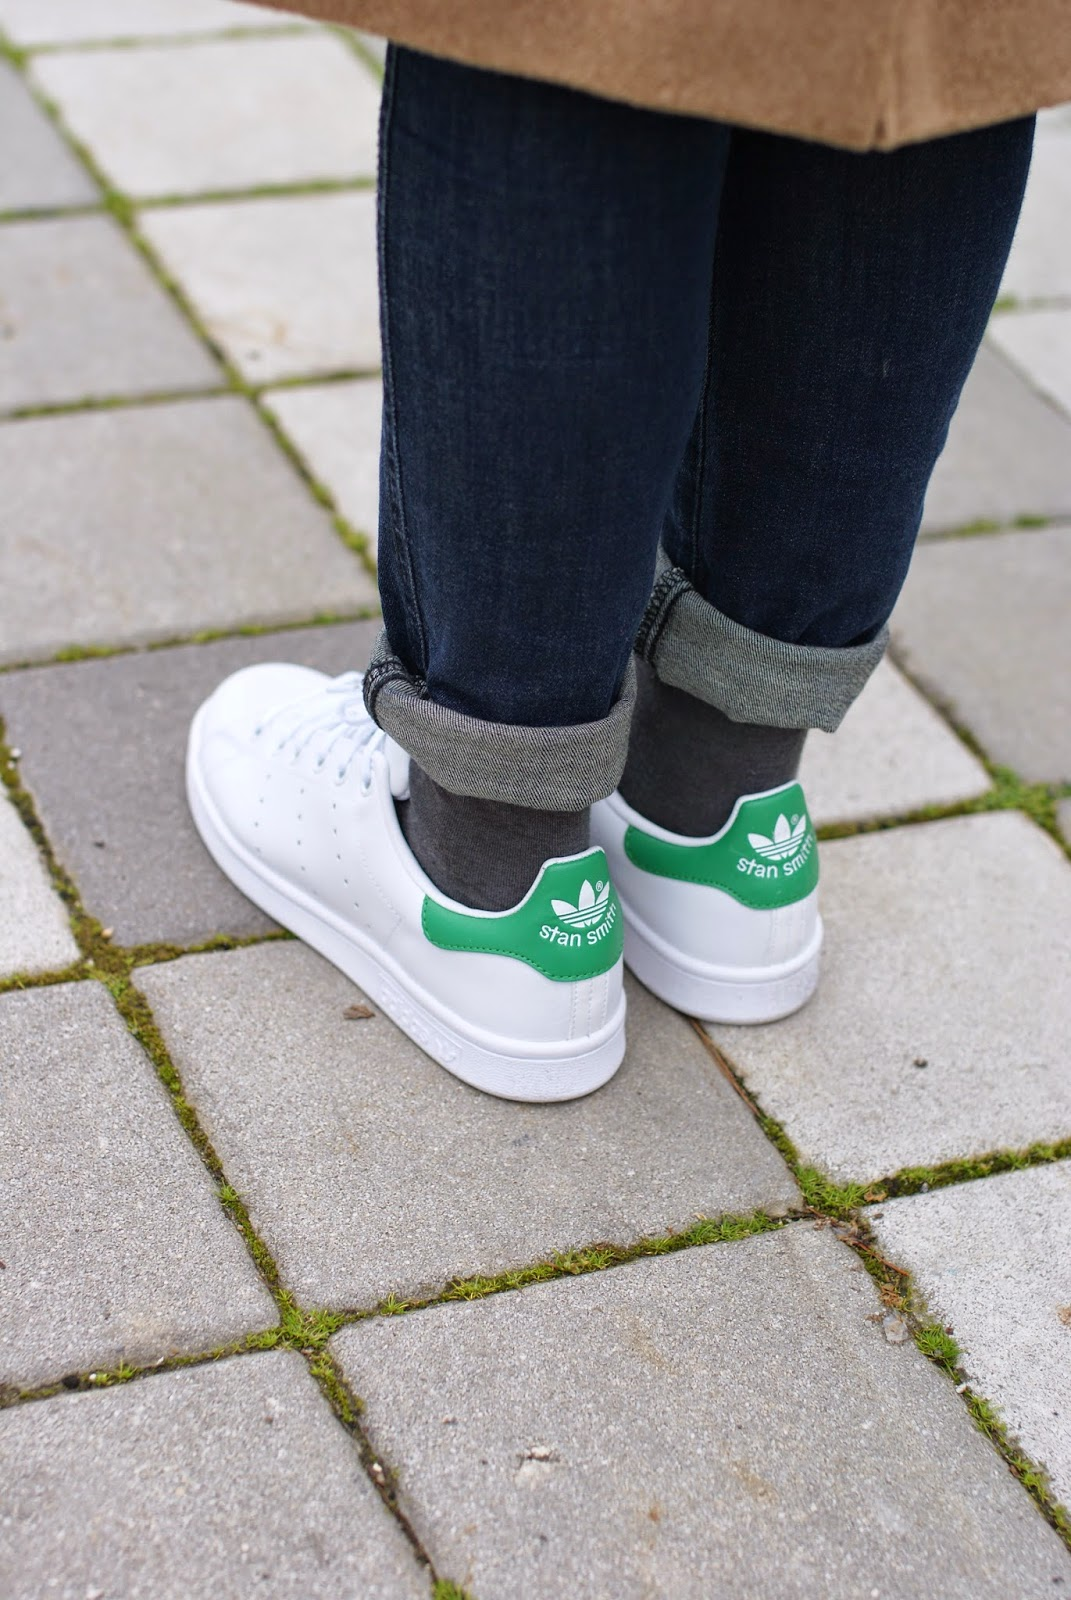 Adidas Stan Smith, Adidas Originals white green sneakers on Fashion and Cookies fashion blog, fashion blogger italiana